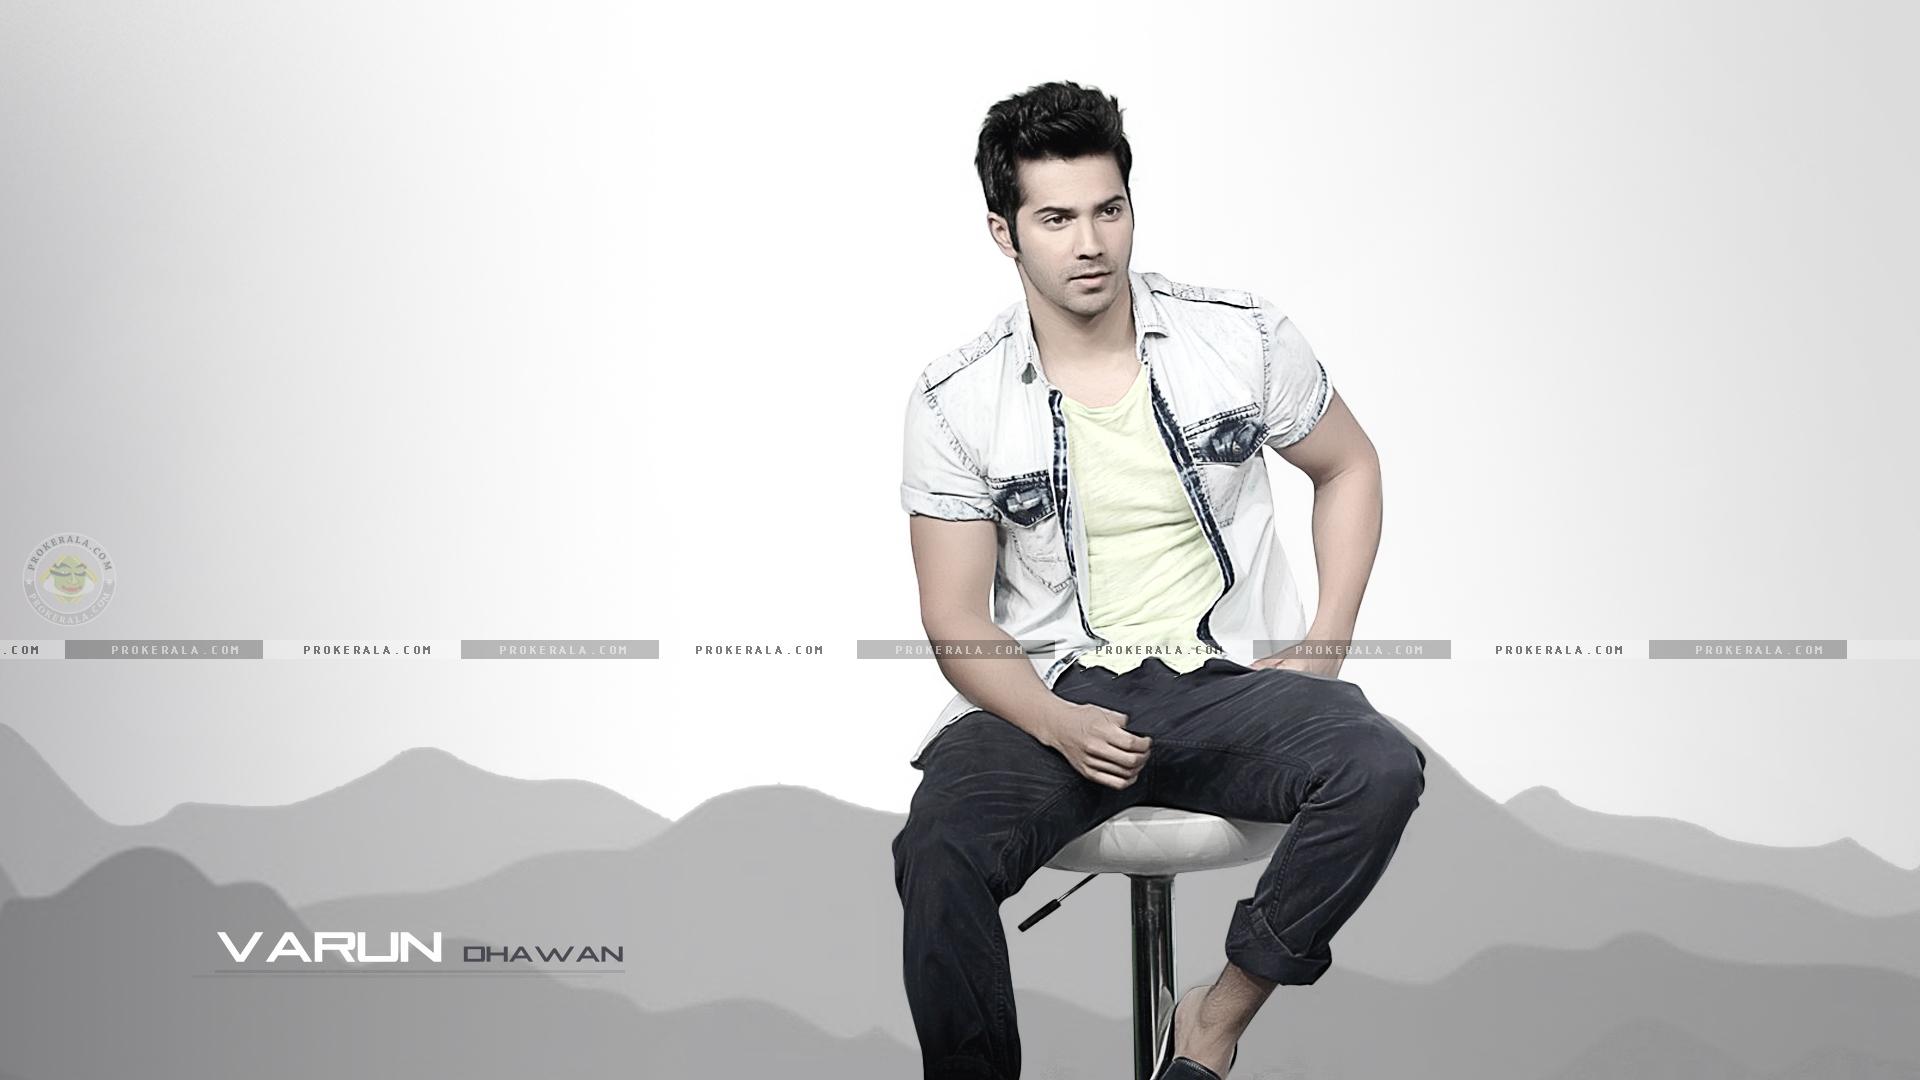 varun dhawan wallpapers page - photo #2